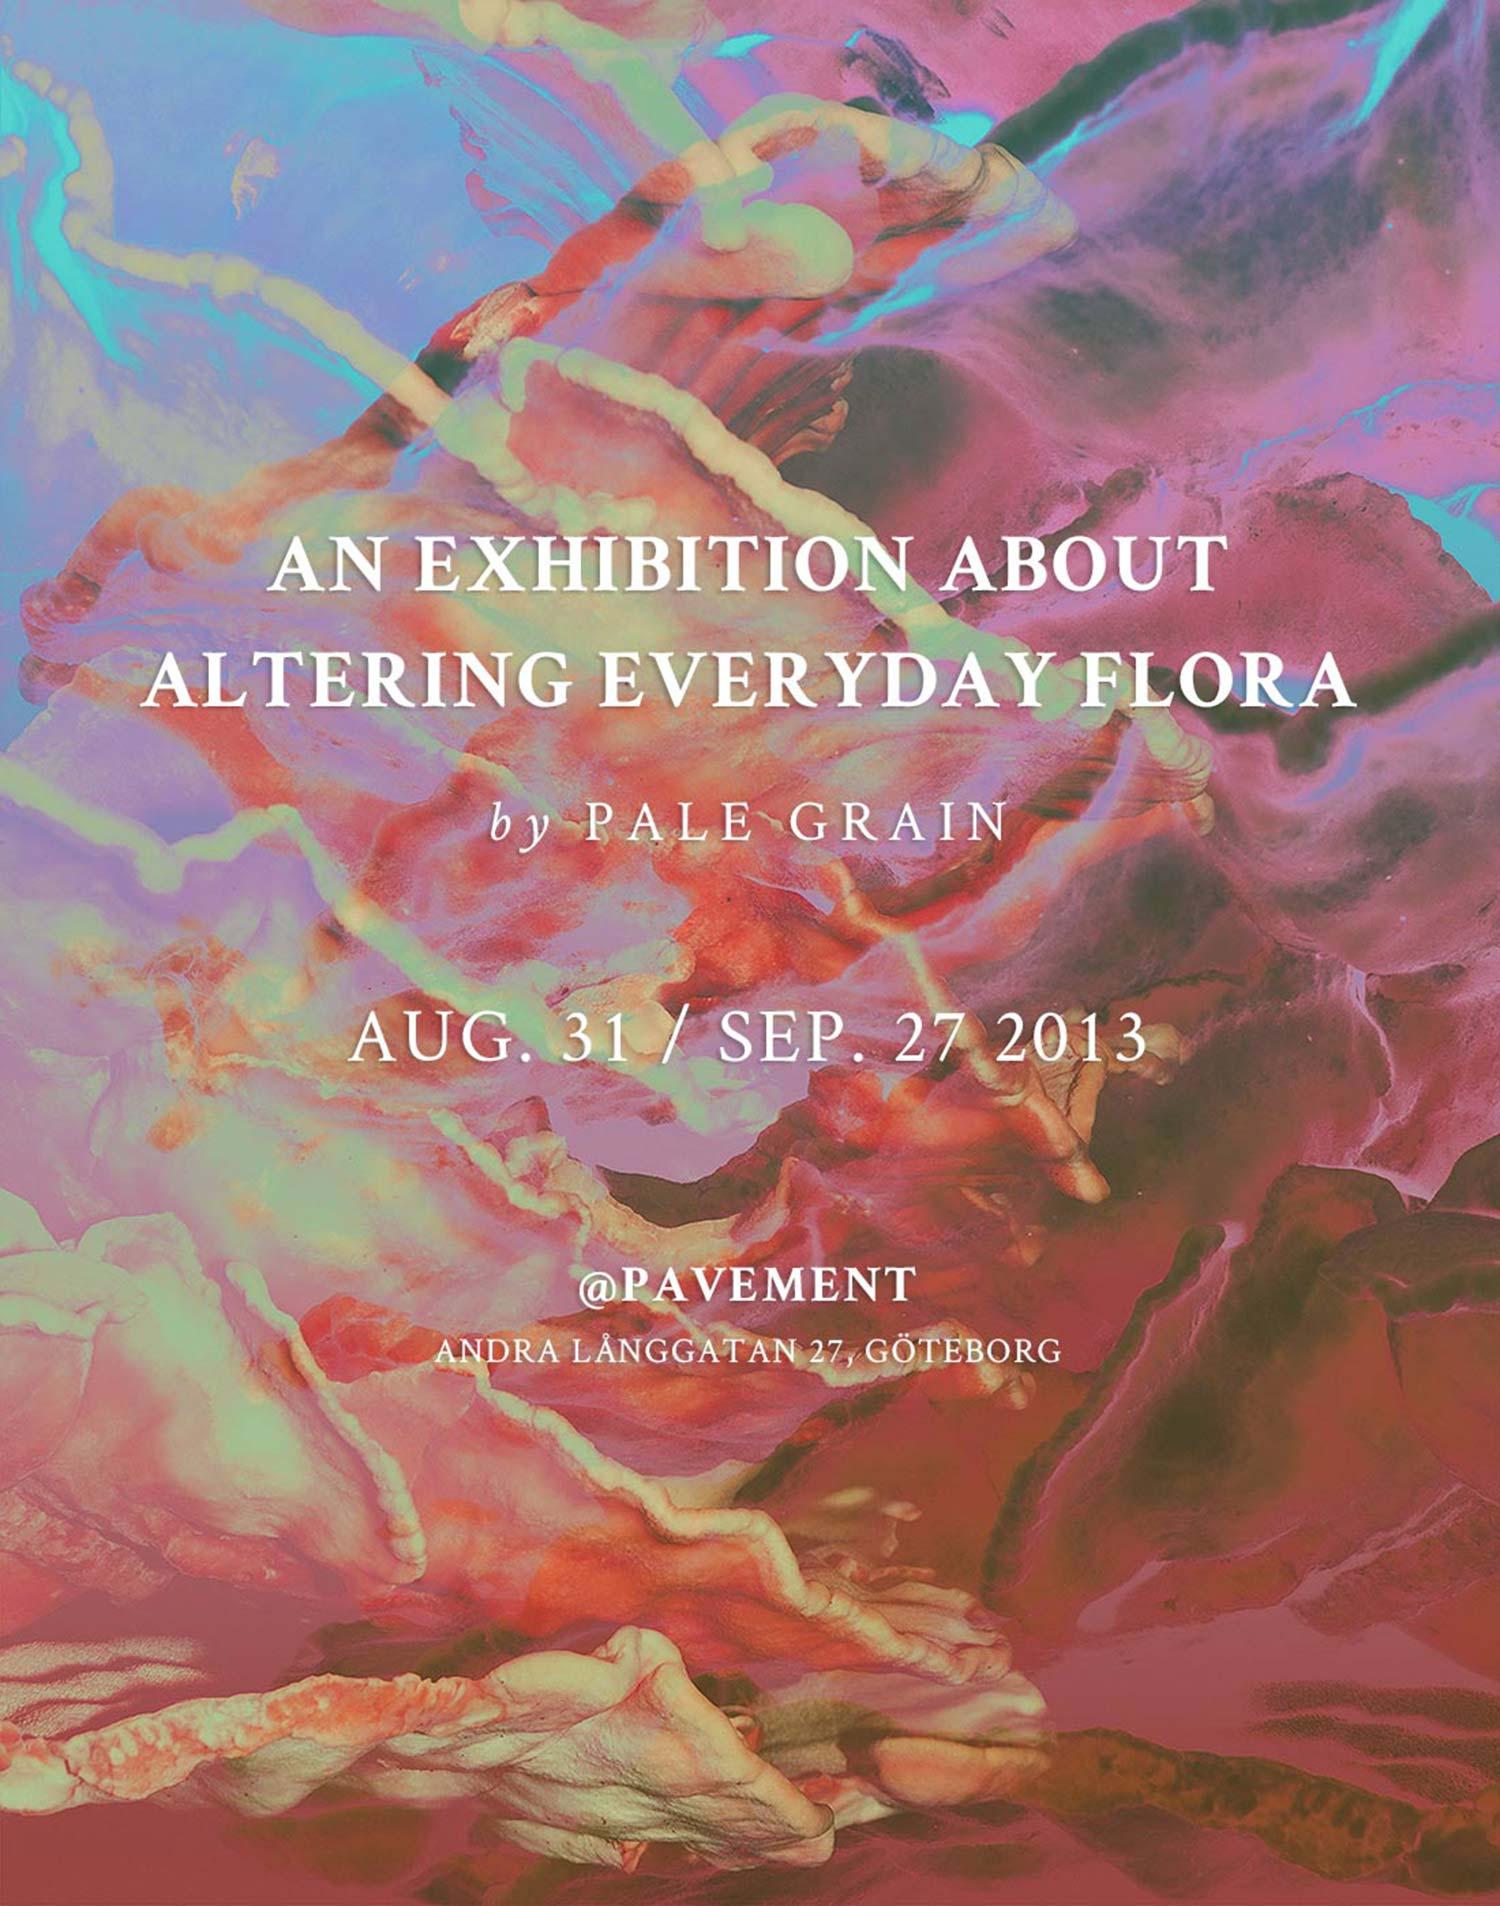 Altering Everyday Flora